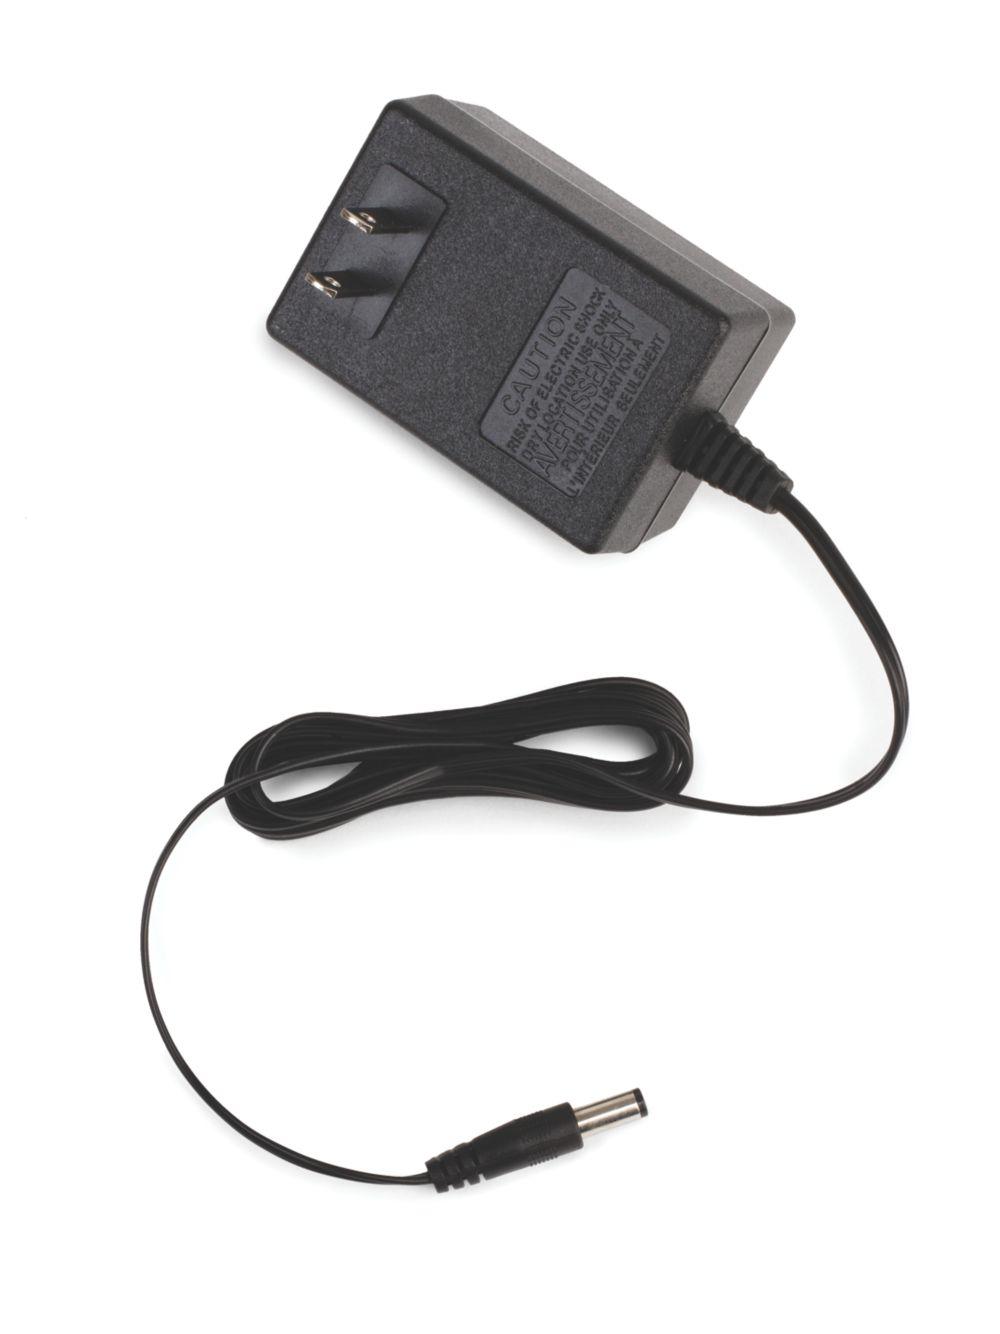 110V/120V transformer, cord